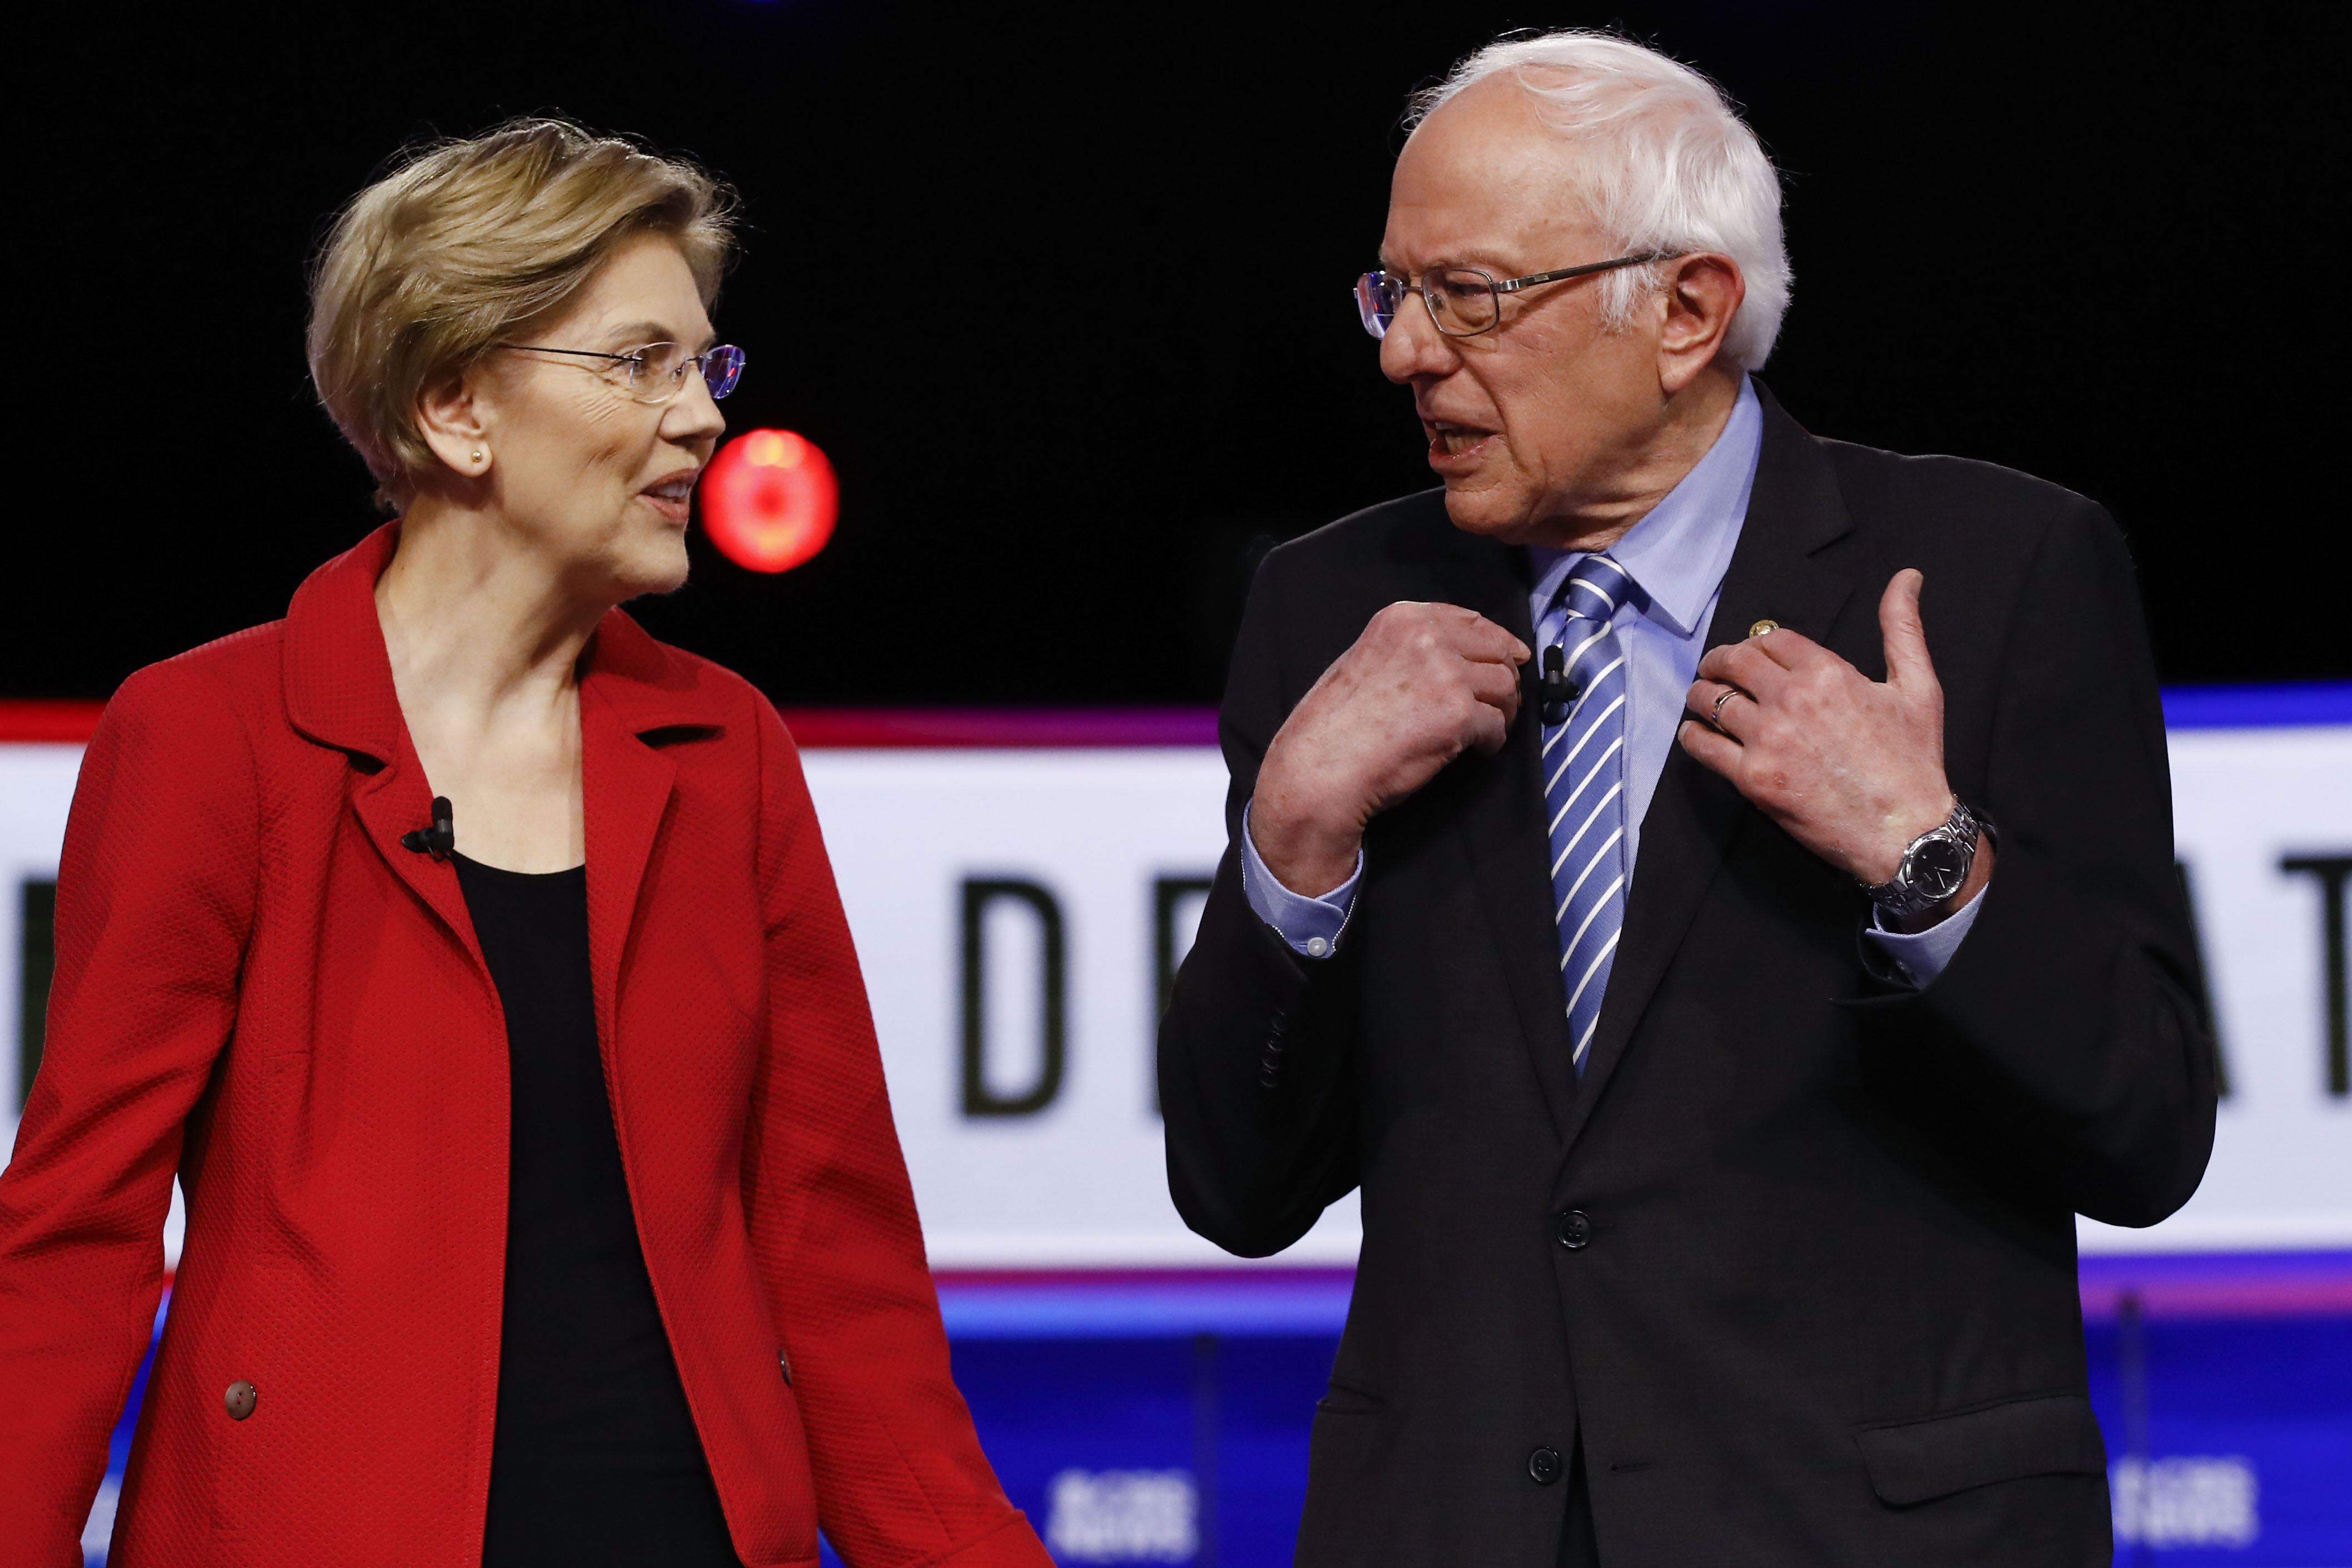 Sen. Elizabeth Warren, D-Mass., and Sen. Bernie Sanders, I-Vt., former Vice President Joe Biden, participate in a Democratic presidential primary debate on Feb. 25, 2020, in Charleston, S.C. (Matt Rourke/AP)